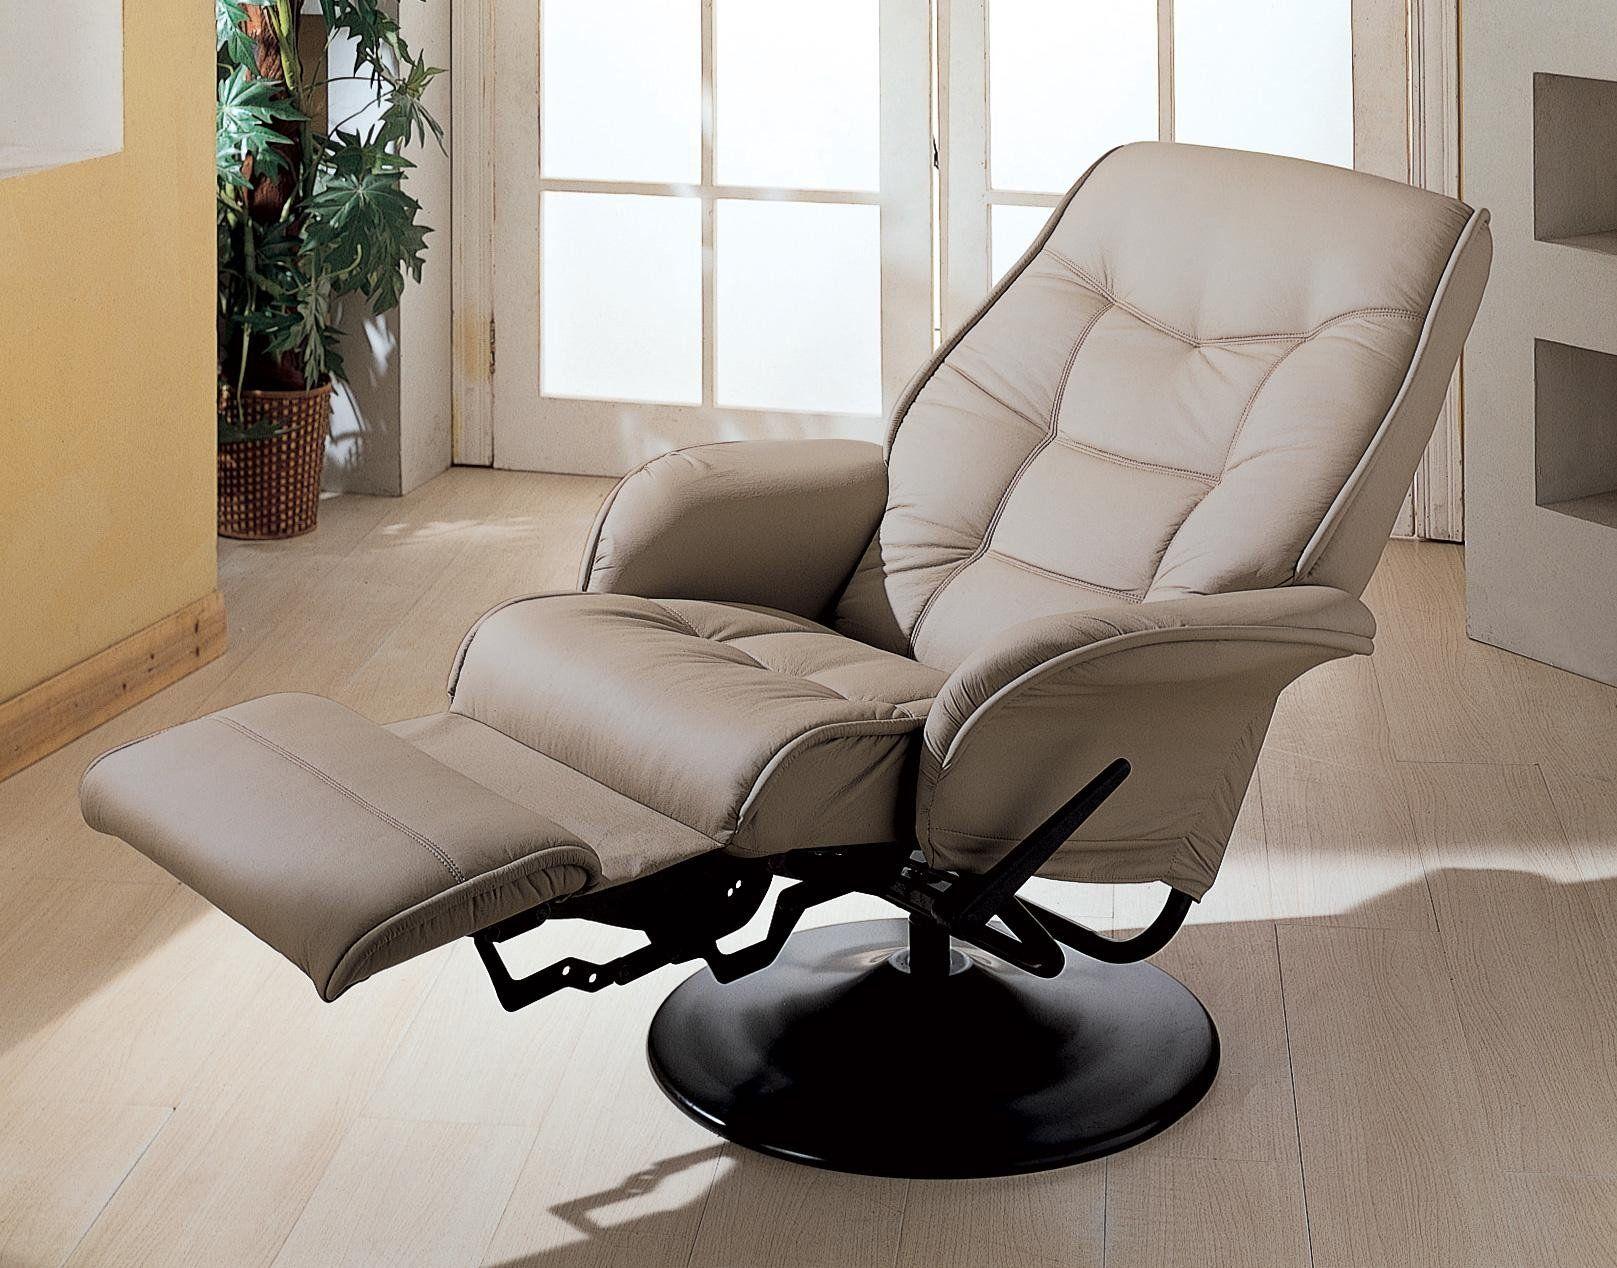 Coaster 7502 Beige Recliner Chair Swivel Recliner Chairs Modern